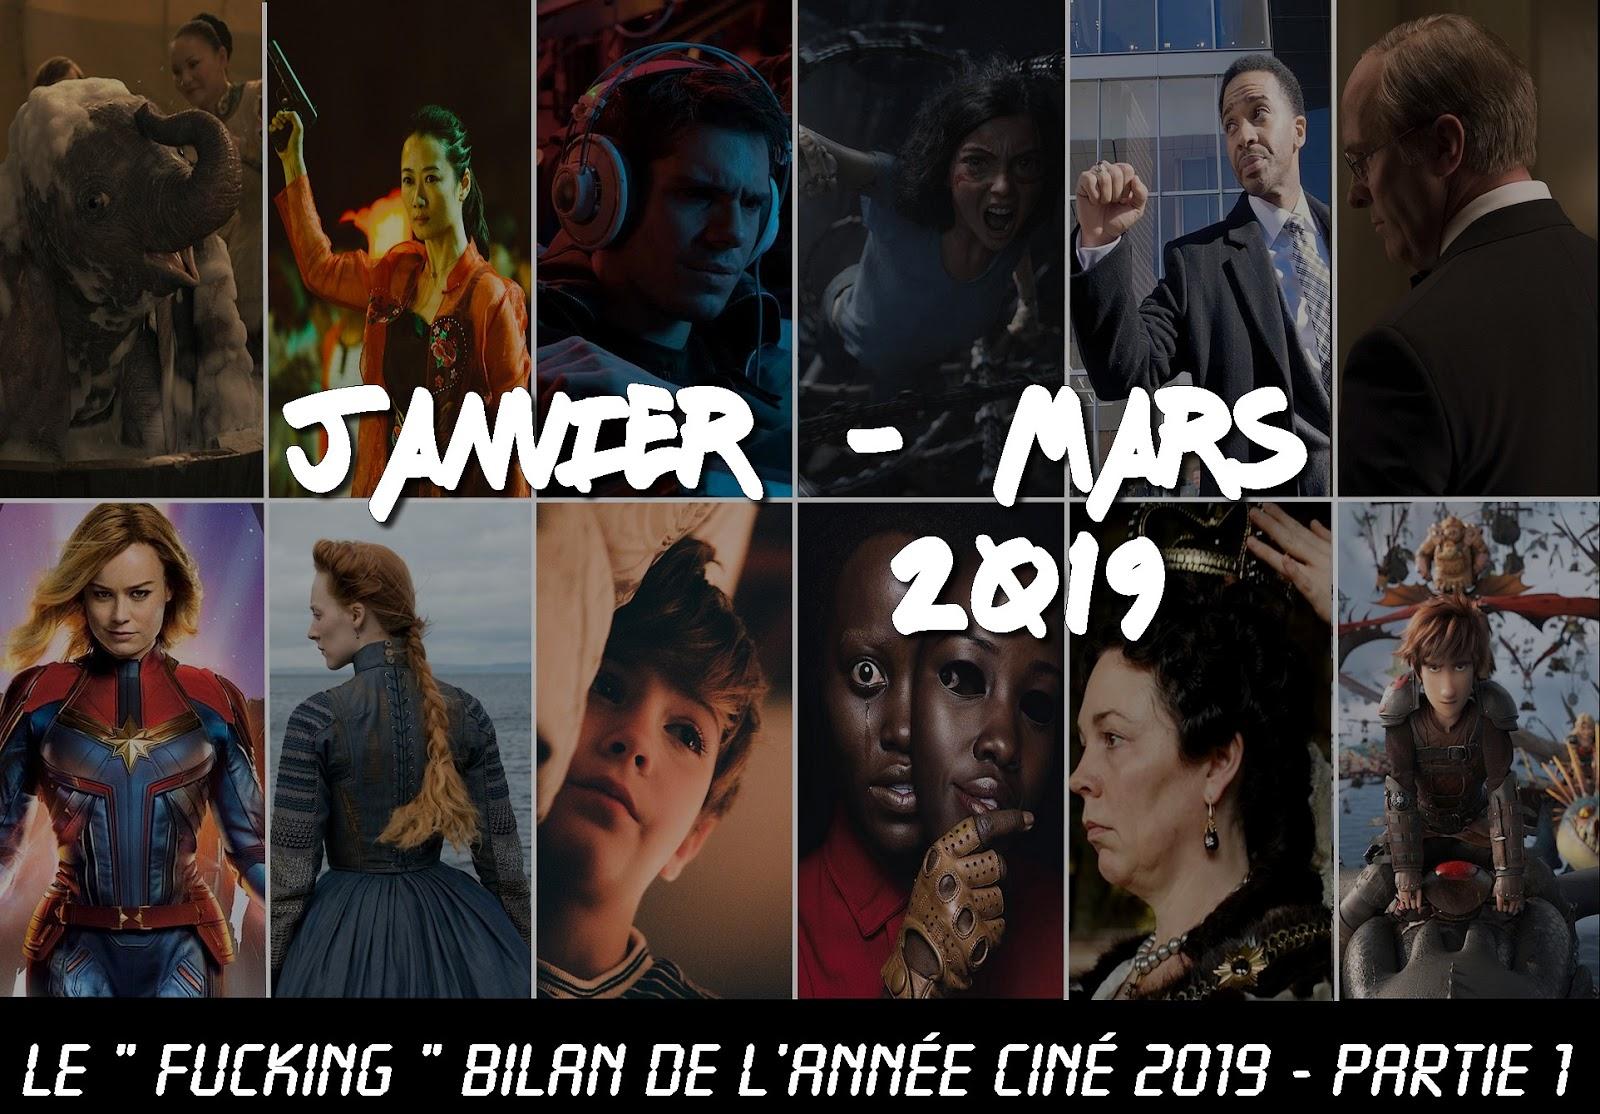 Bilan Ciné 2019 - Partie 1